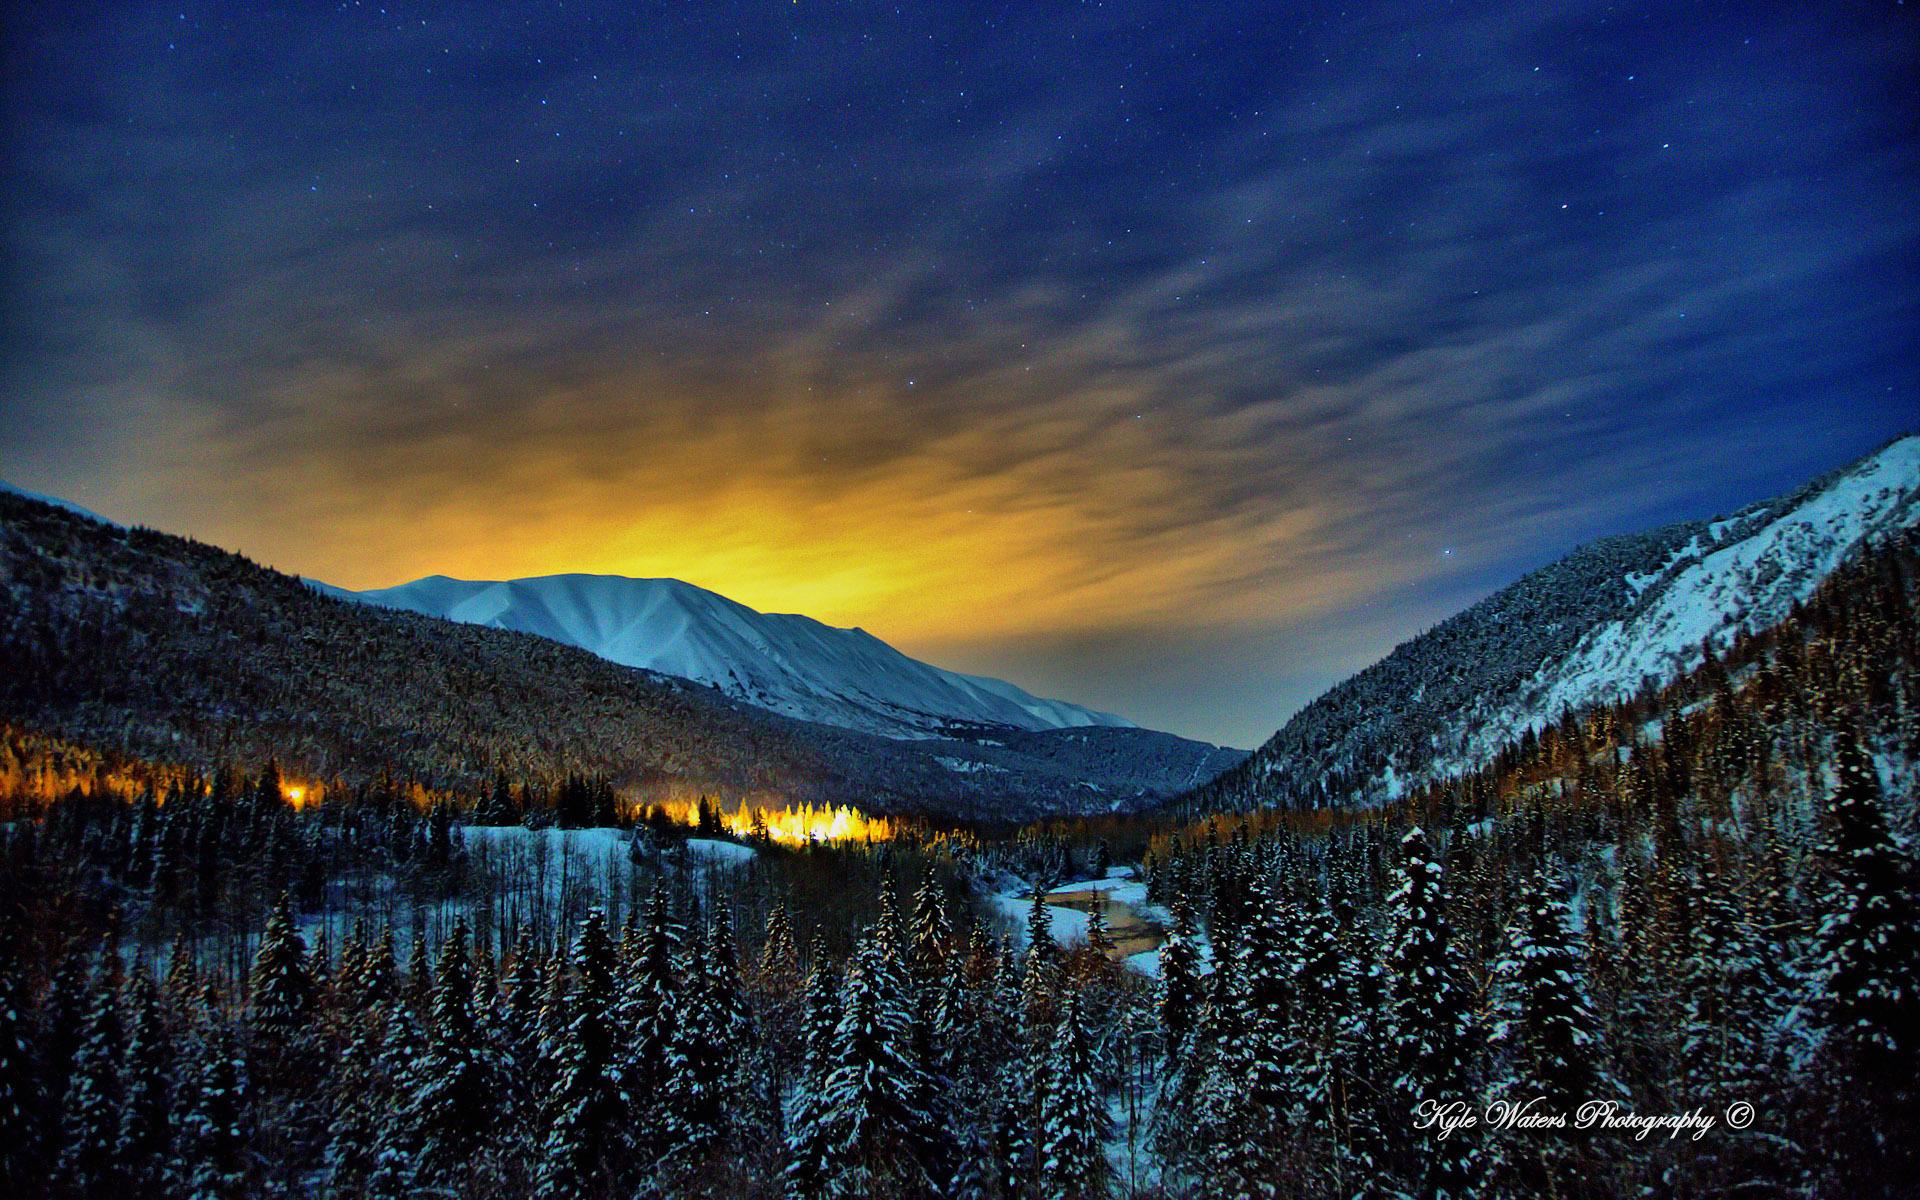 Alaska Winter Nights Wallpapers HD Wallpapers 1920x1200